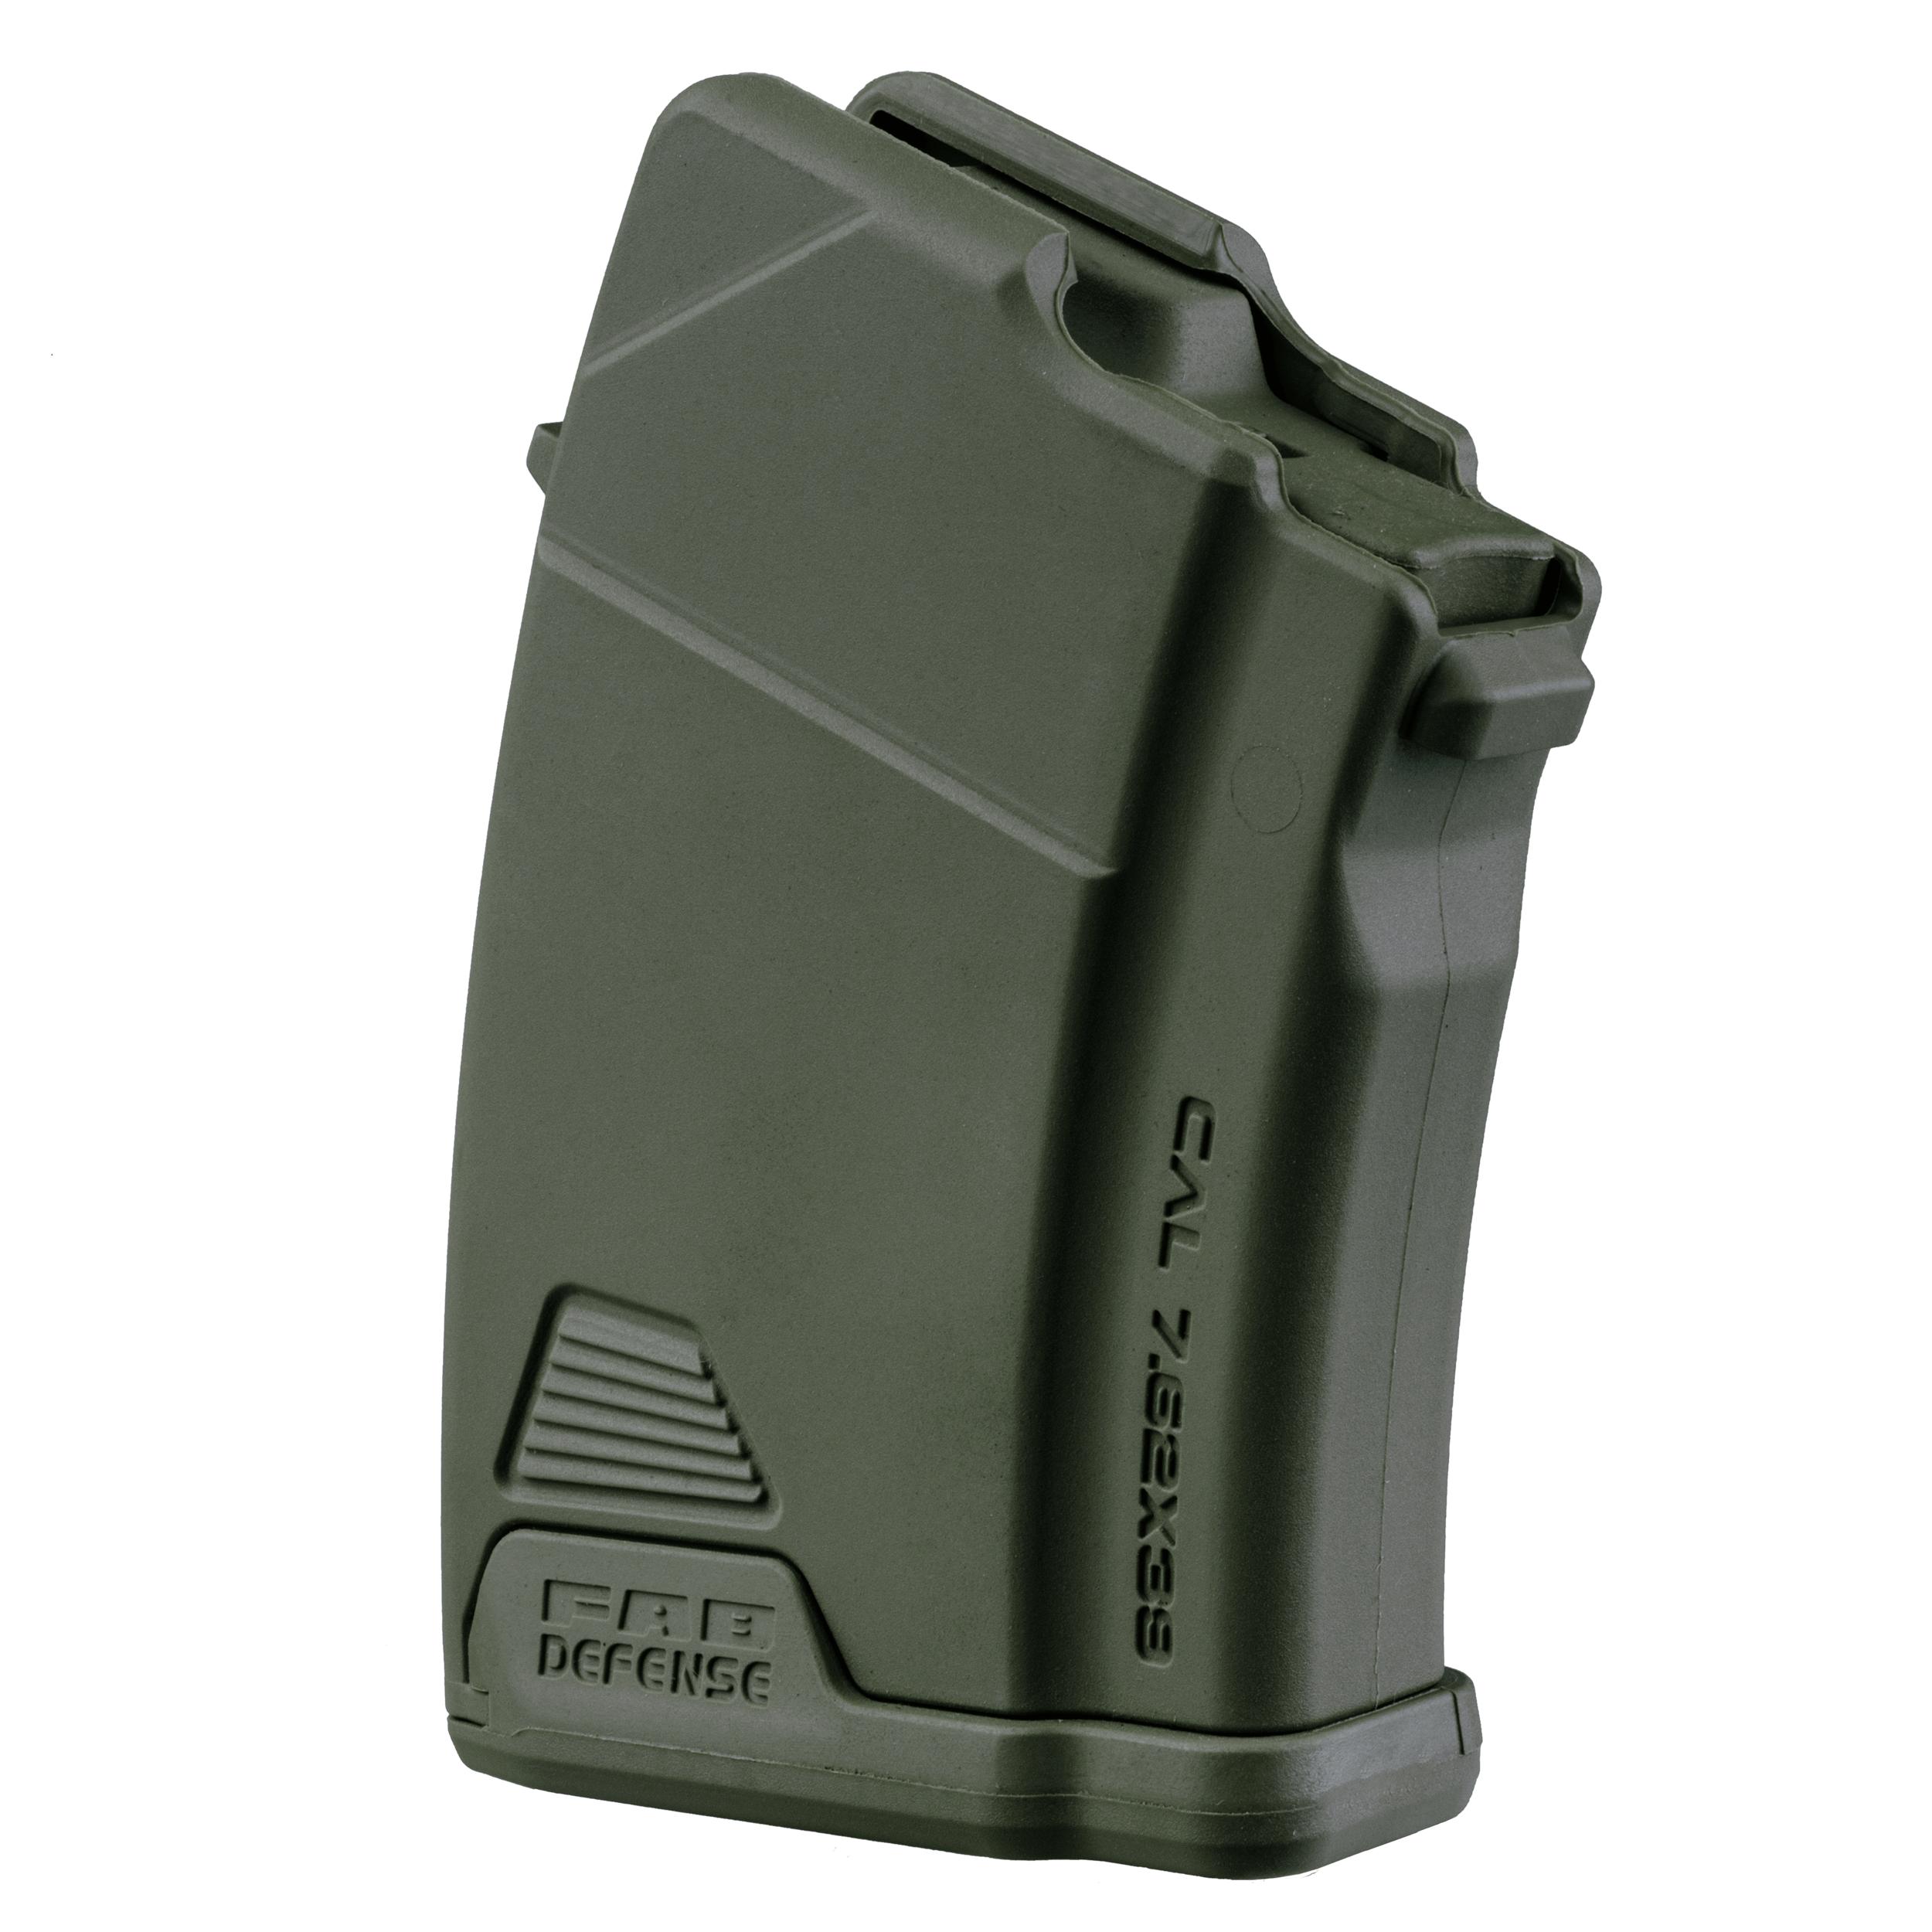 AK47 10 Rounds Polymer Magazine